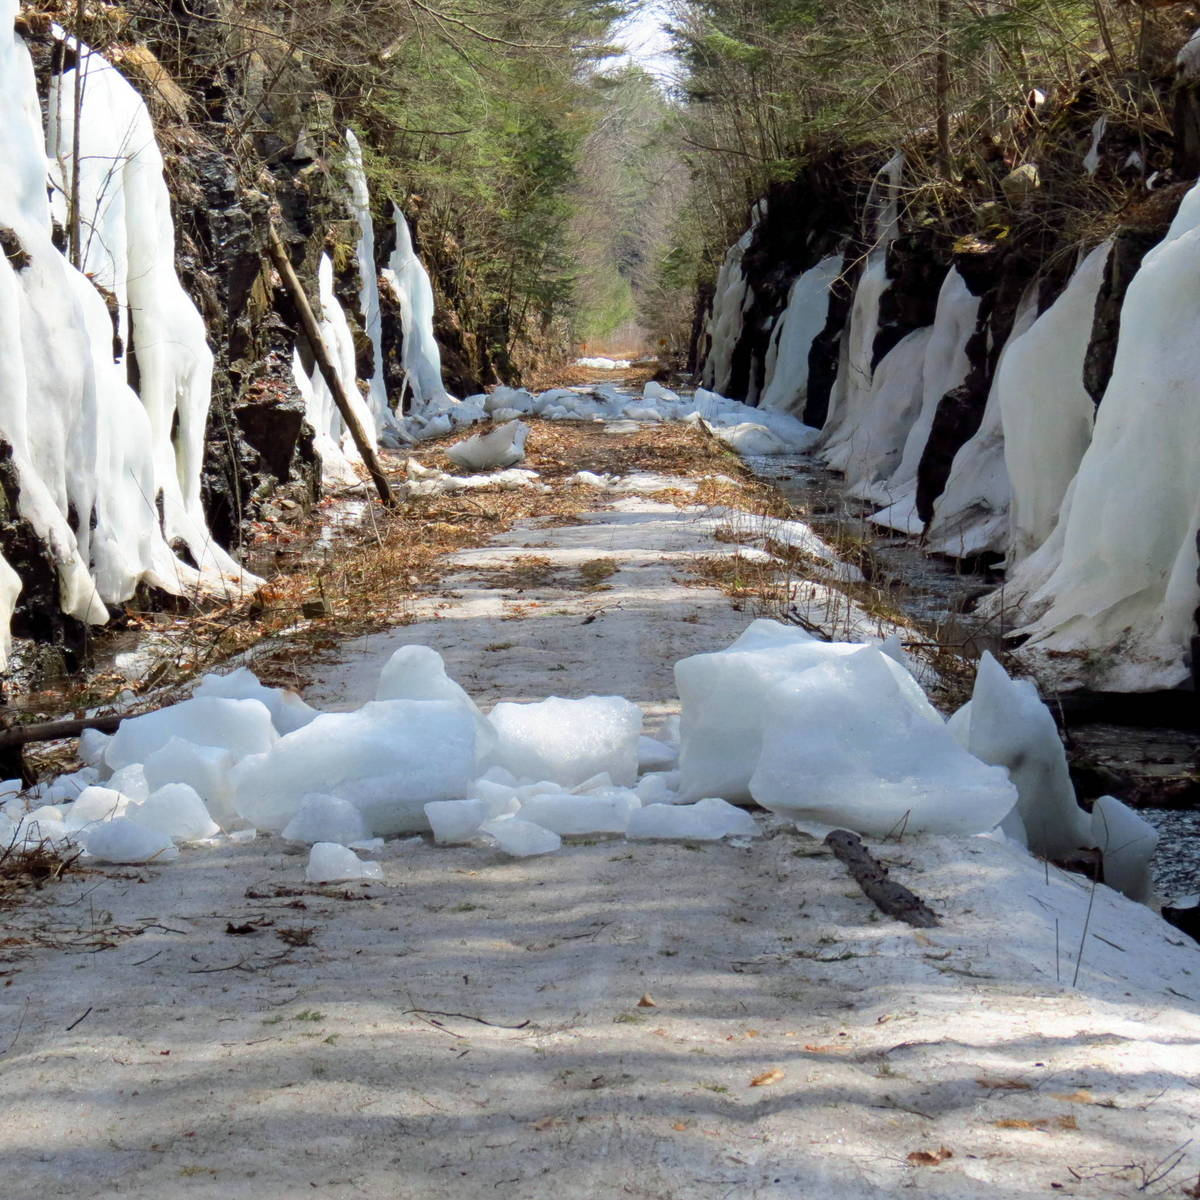 12. Fallen Ice